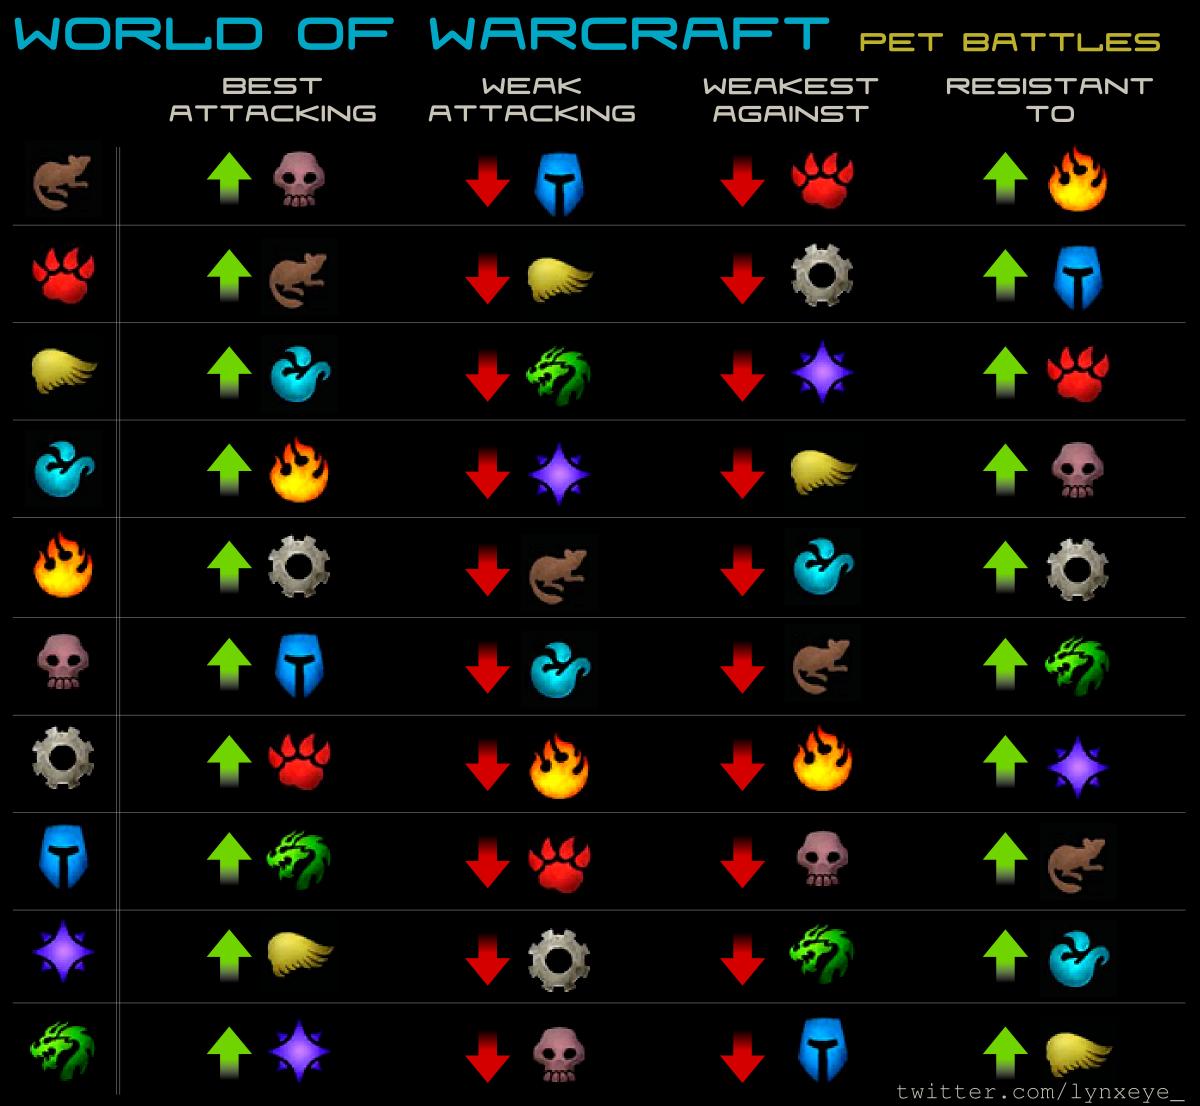 world of warcraft pet battle chart yahoo image search results rh pinterest com Pet Battle Trainer Stormwind Battle Pet Tips